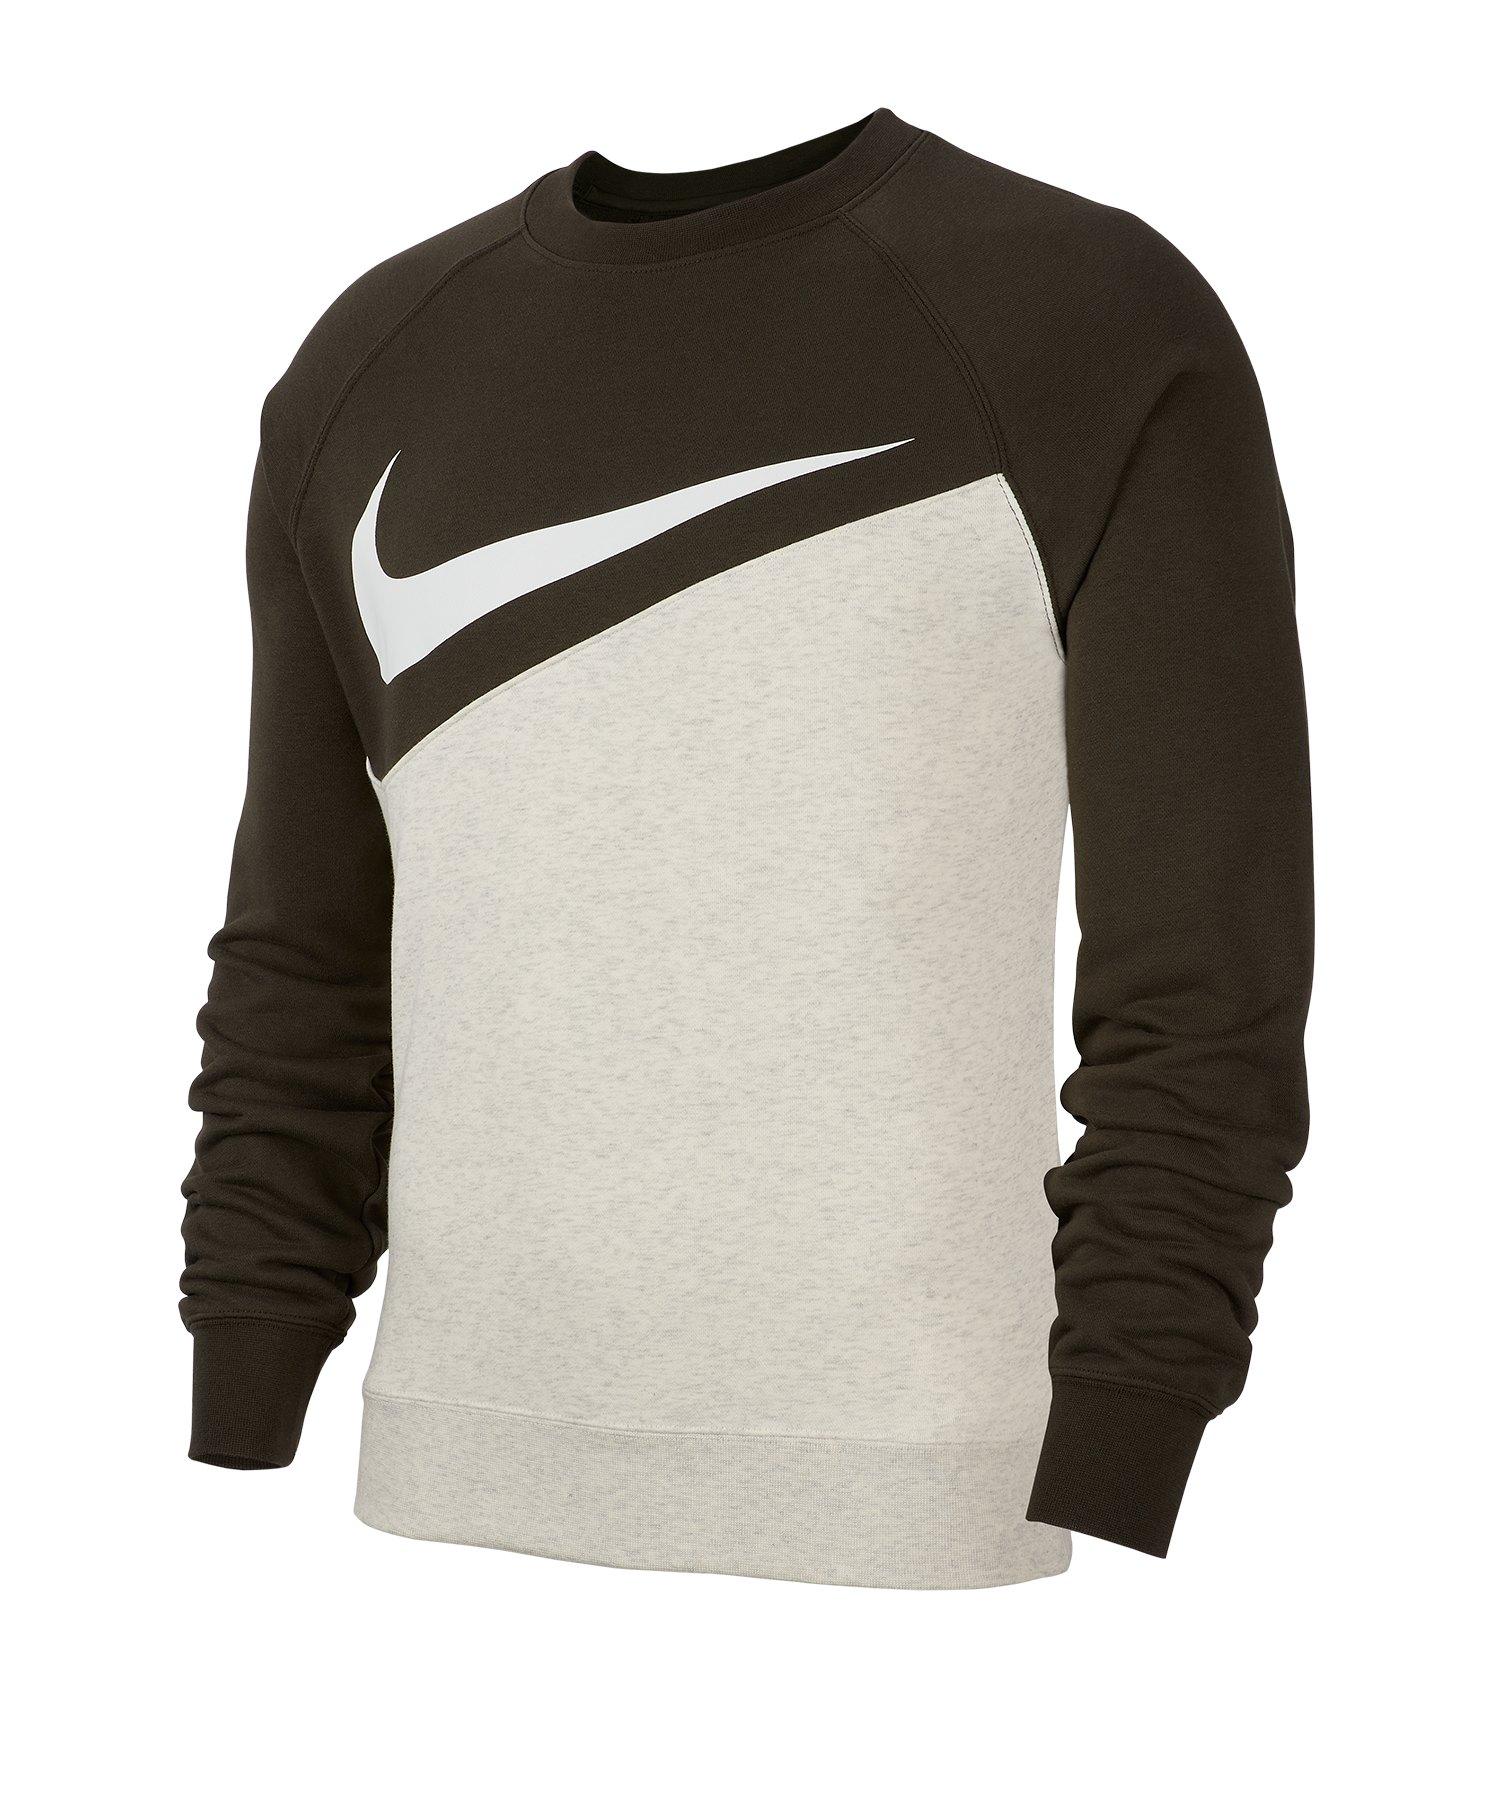 Nike Swoosh French Terry Crew Langarmshirt F141 - grau